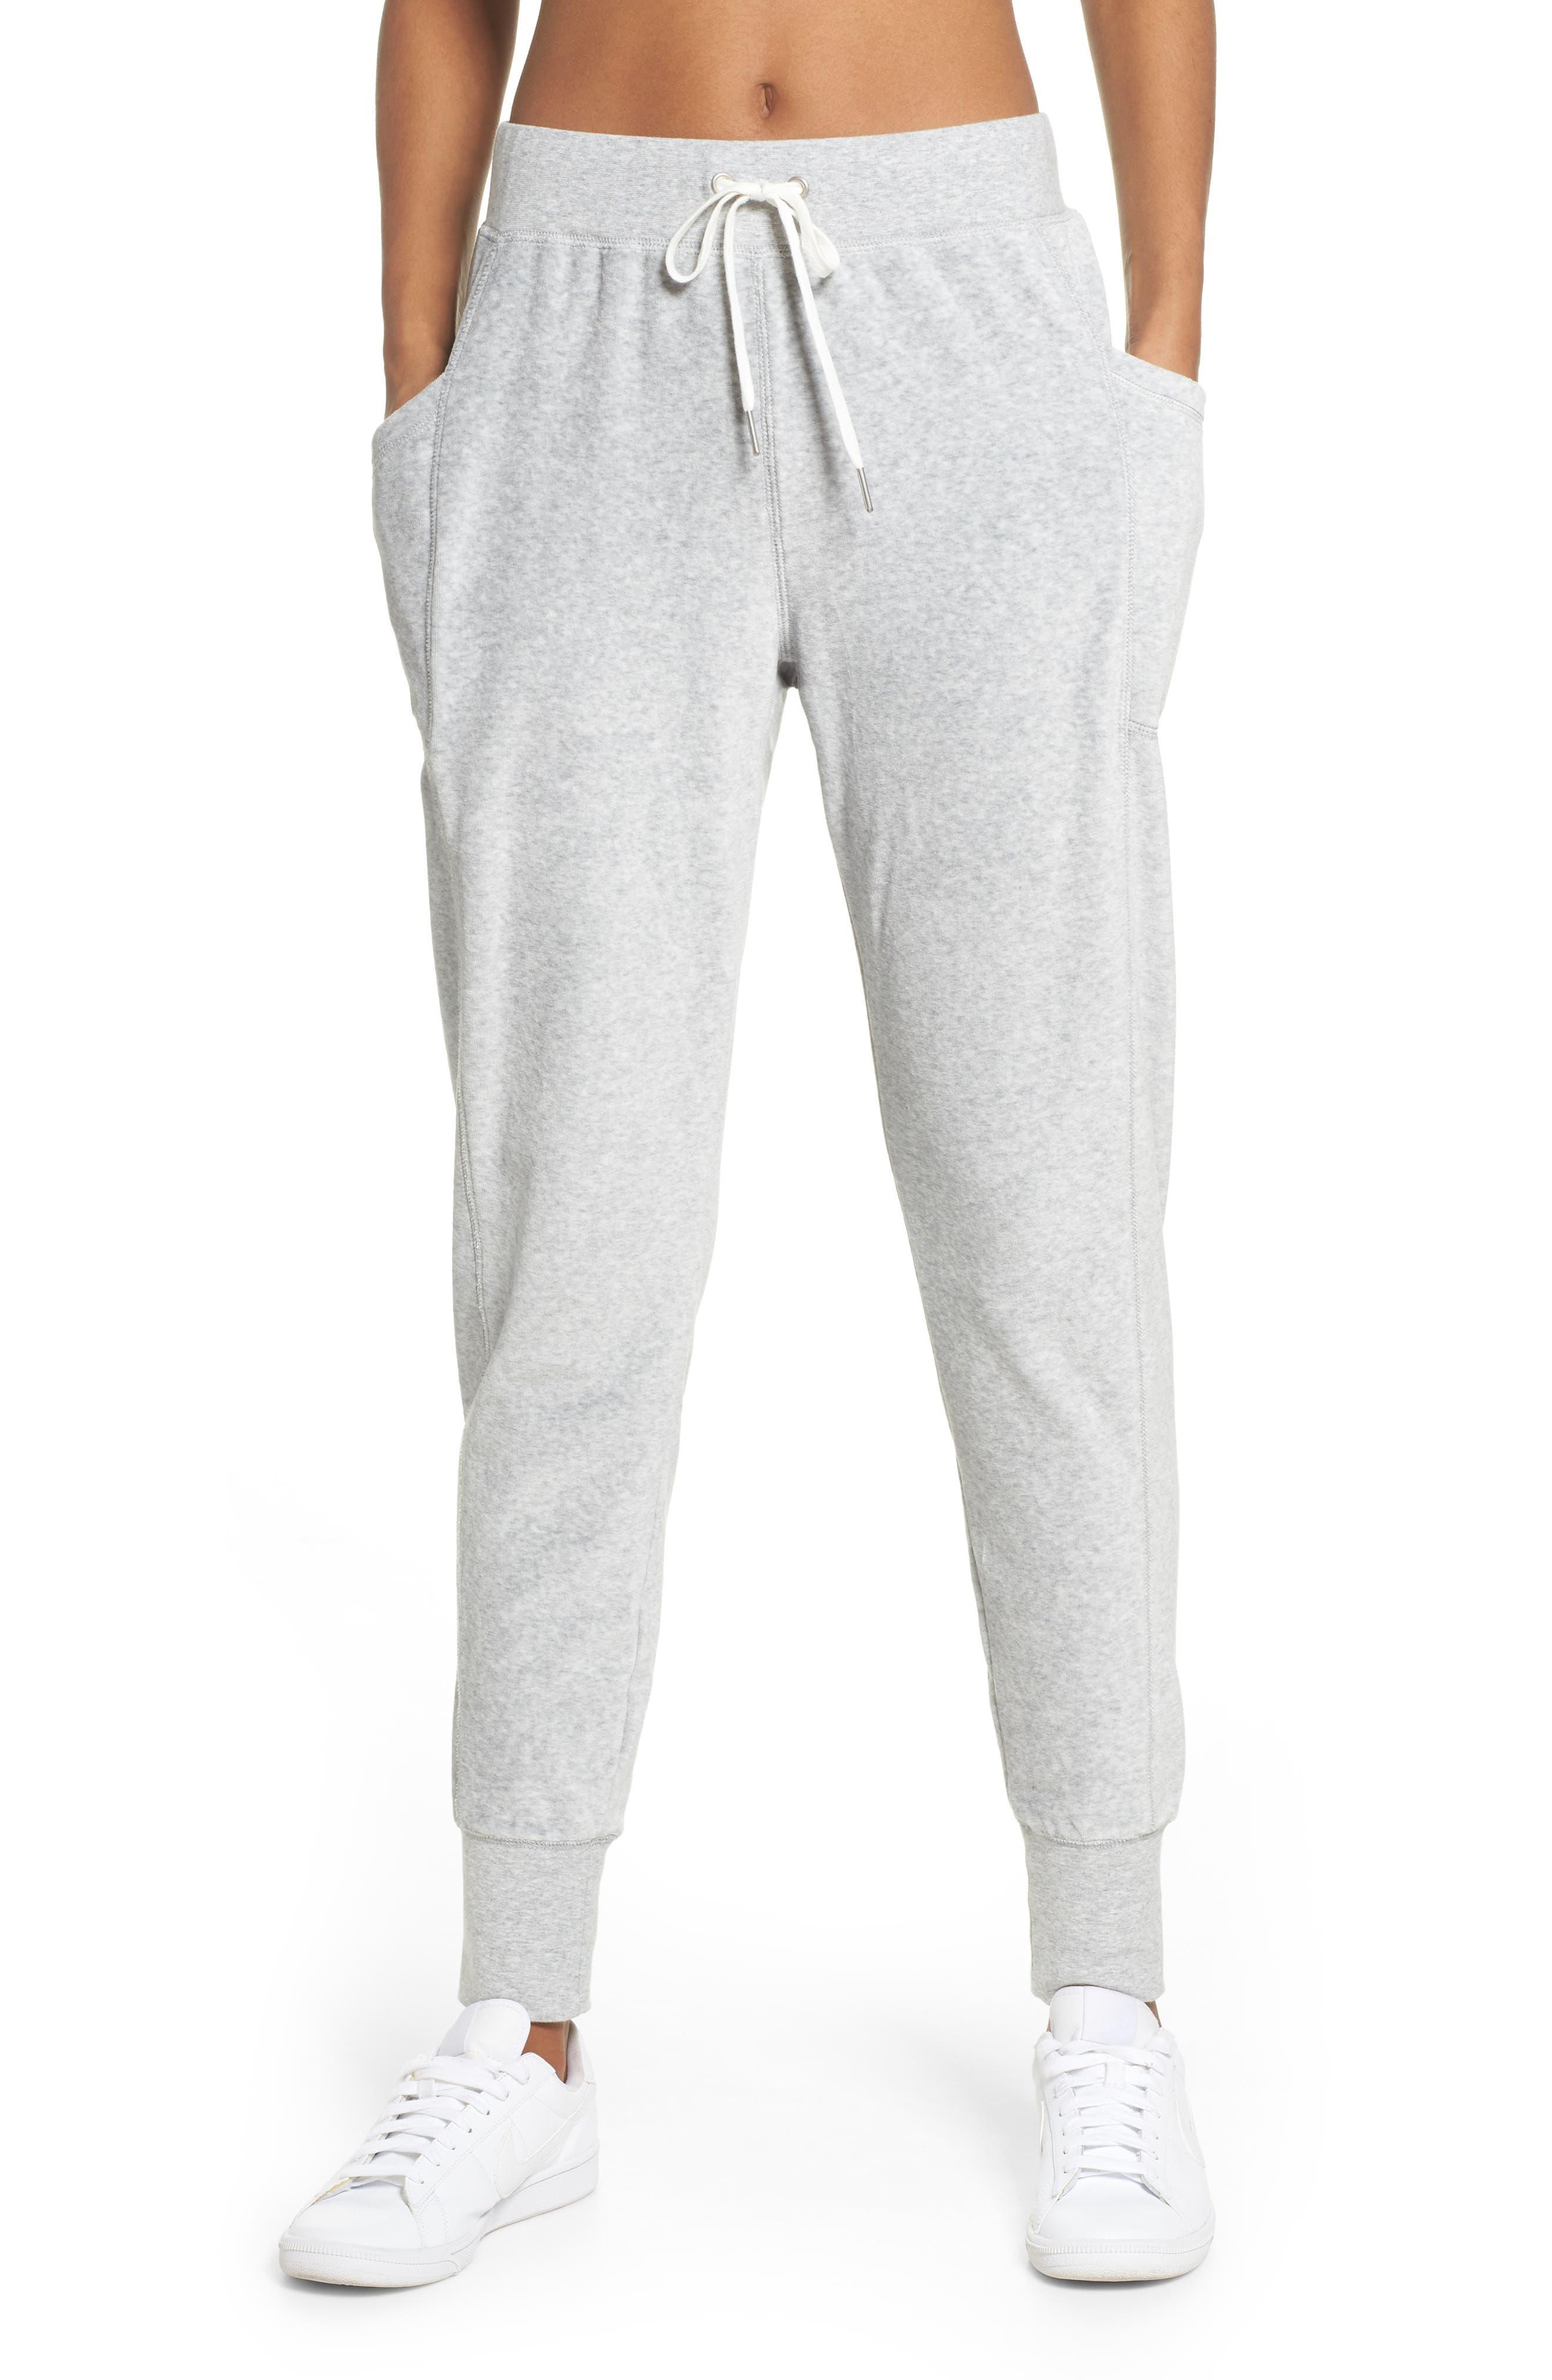 Lexi Slim Velour Leggings,                         Main,                         color, Grey Light Heather